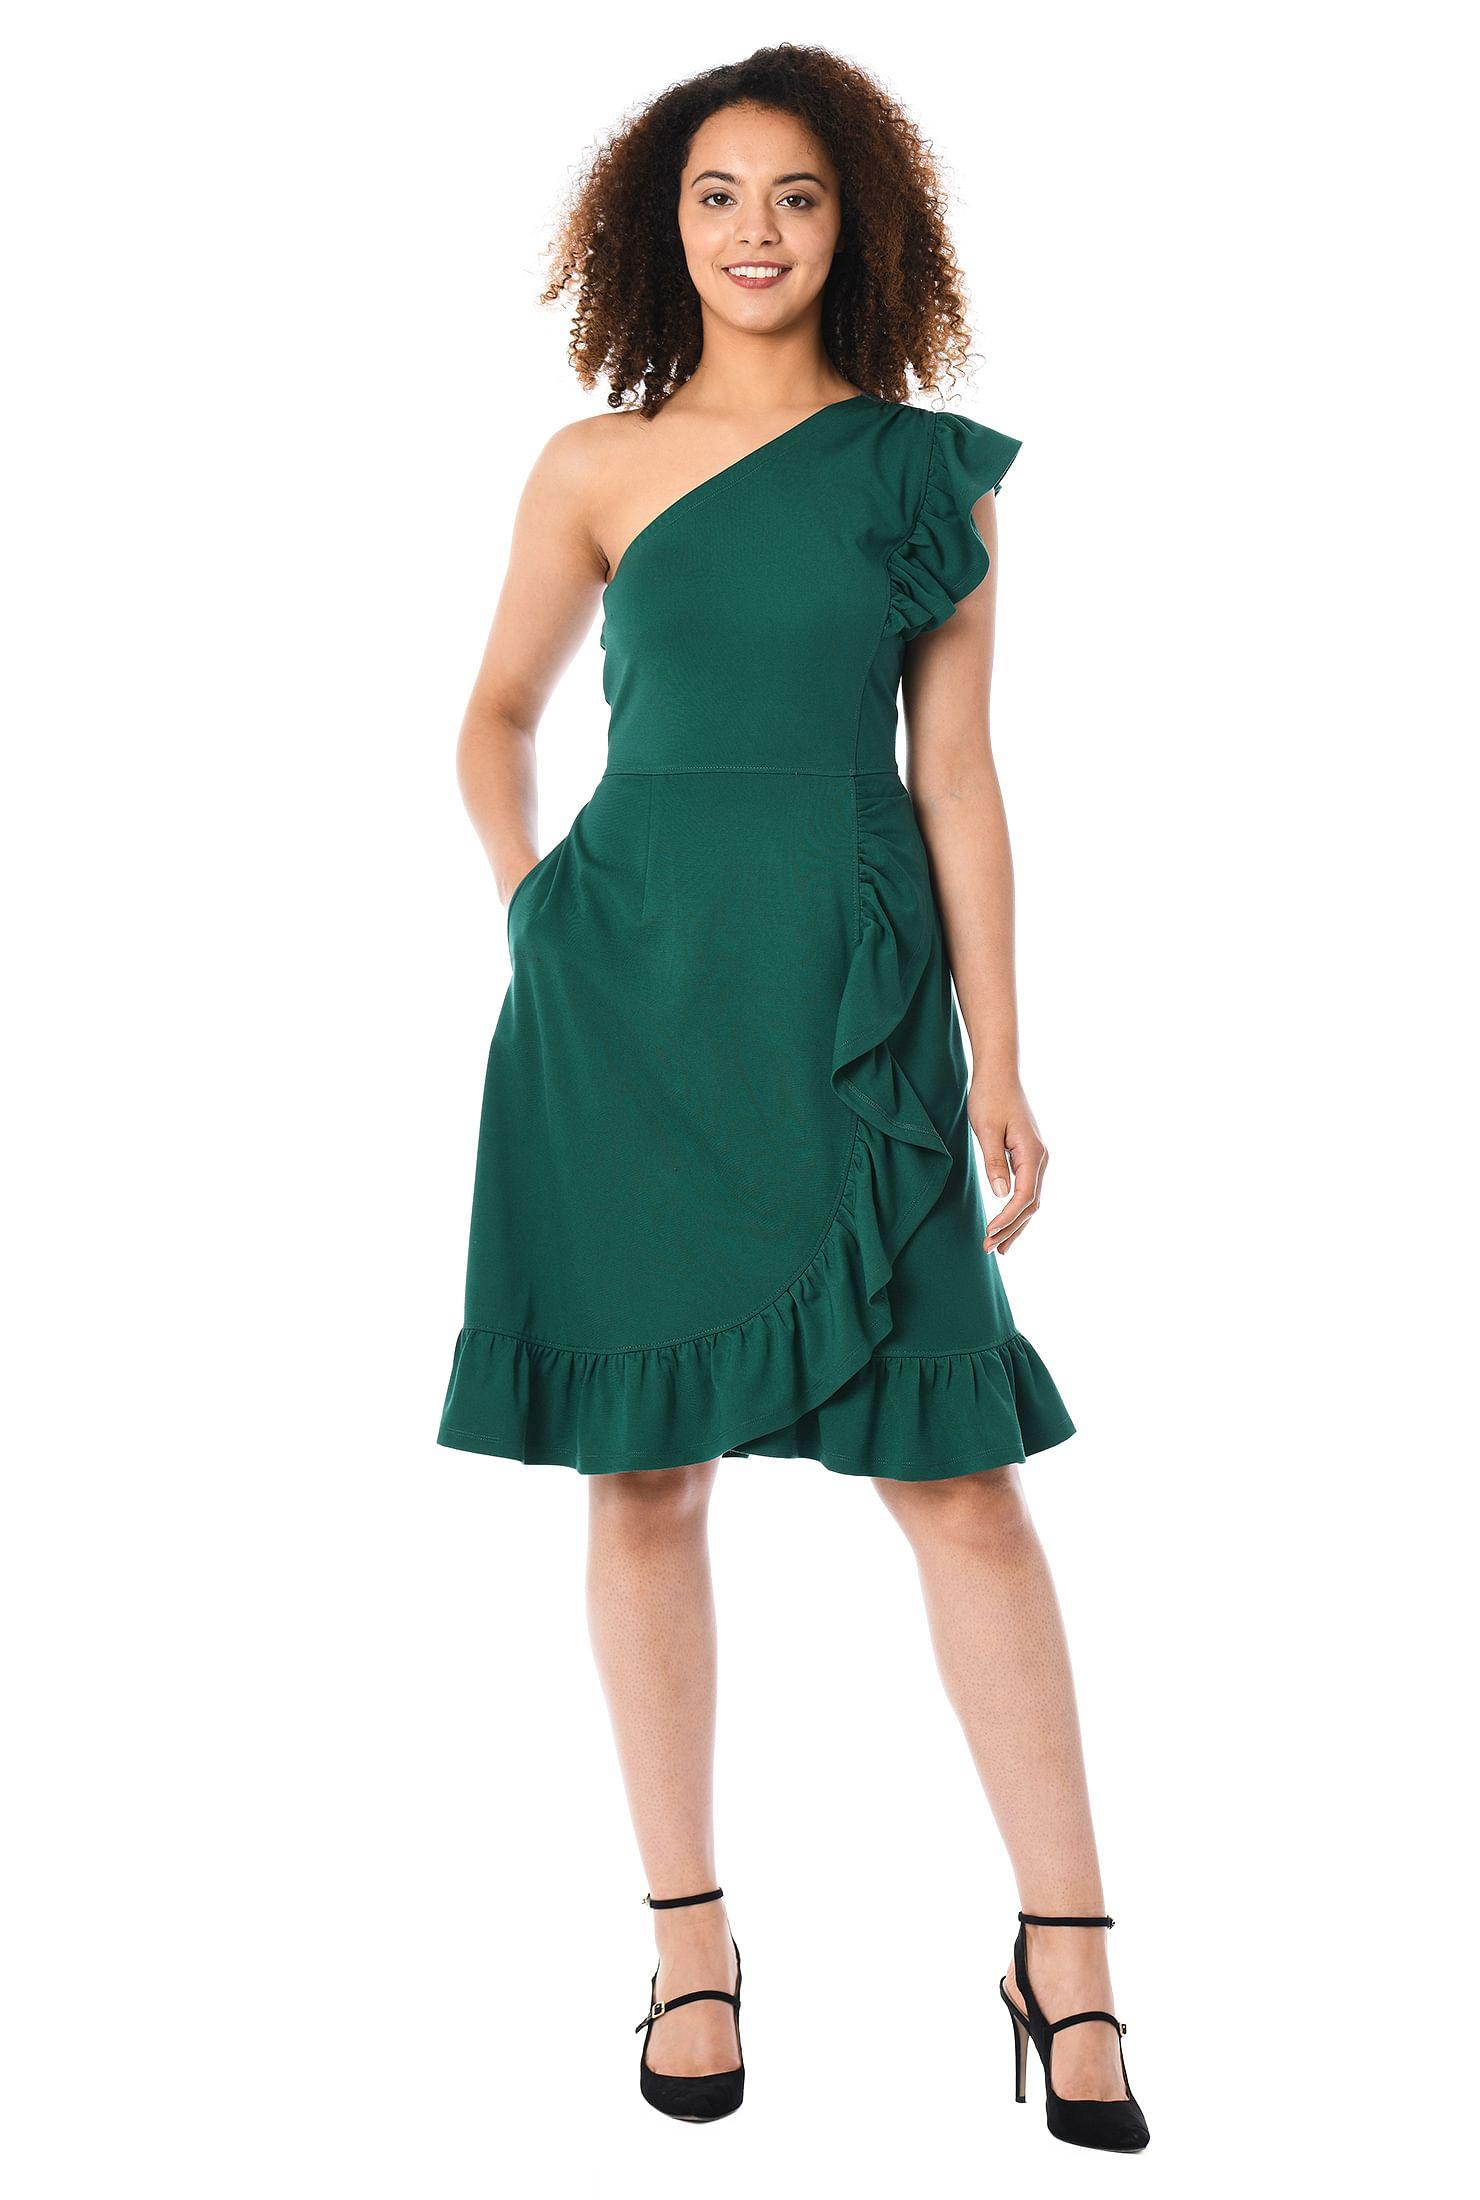 One-shoulder ruffle ponte knit dress